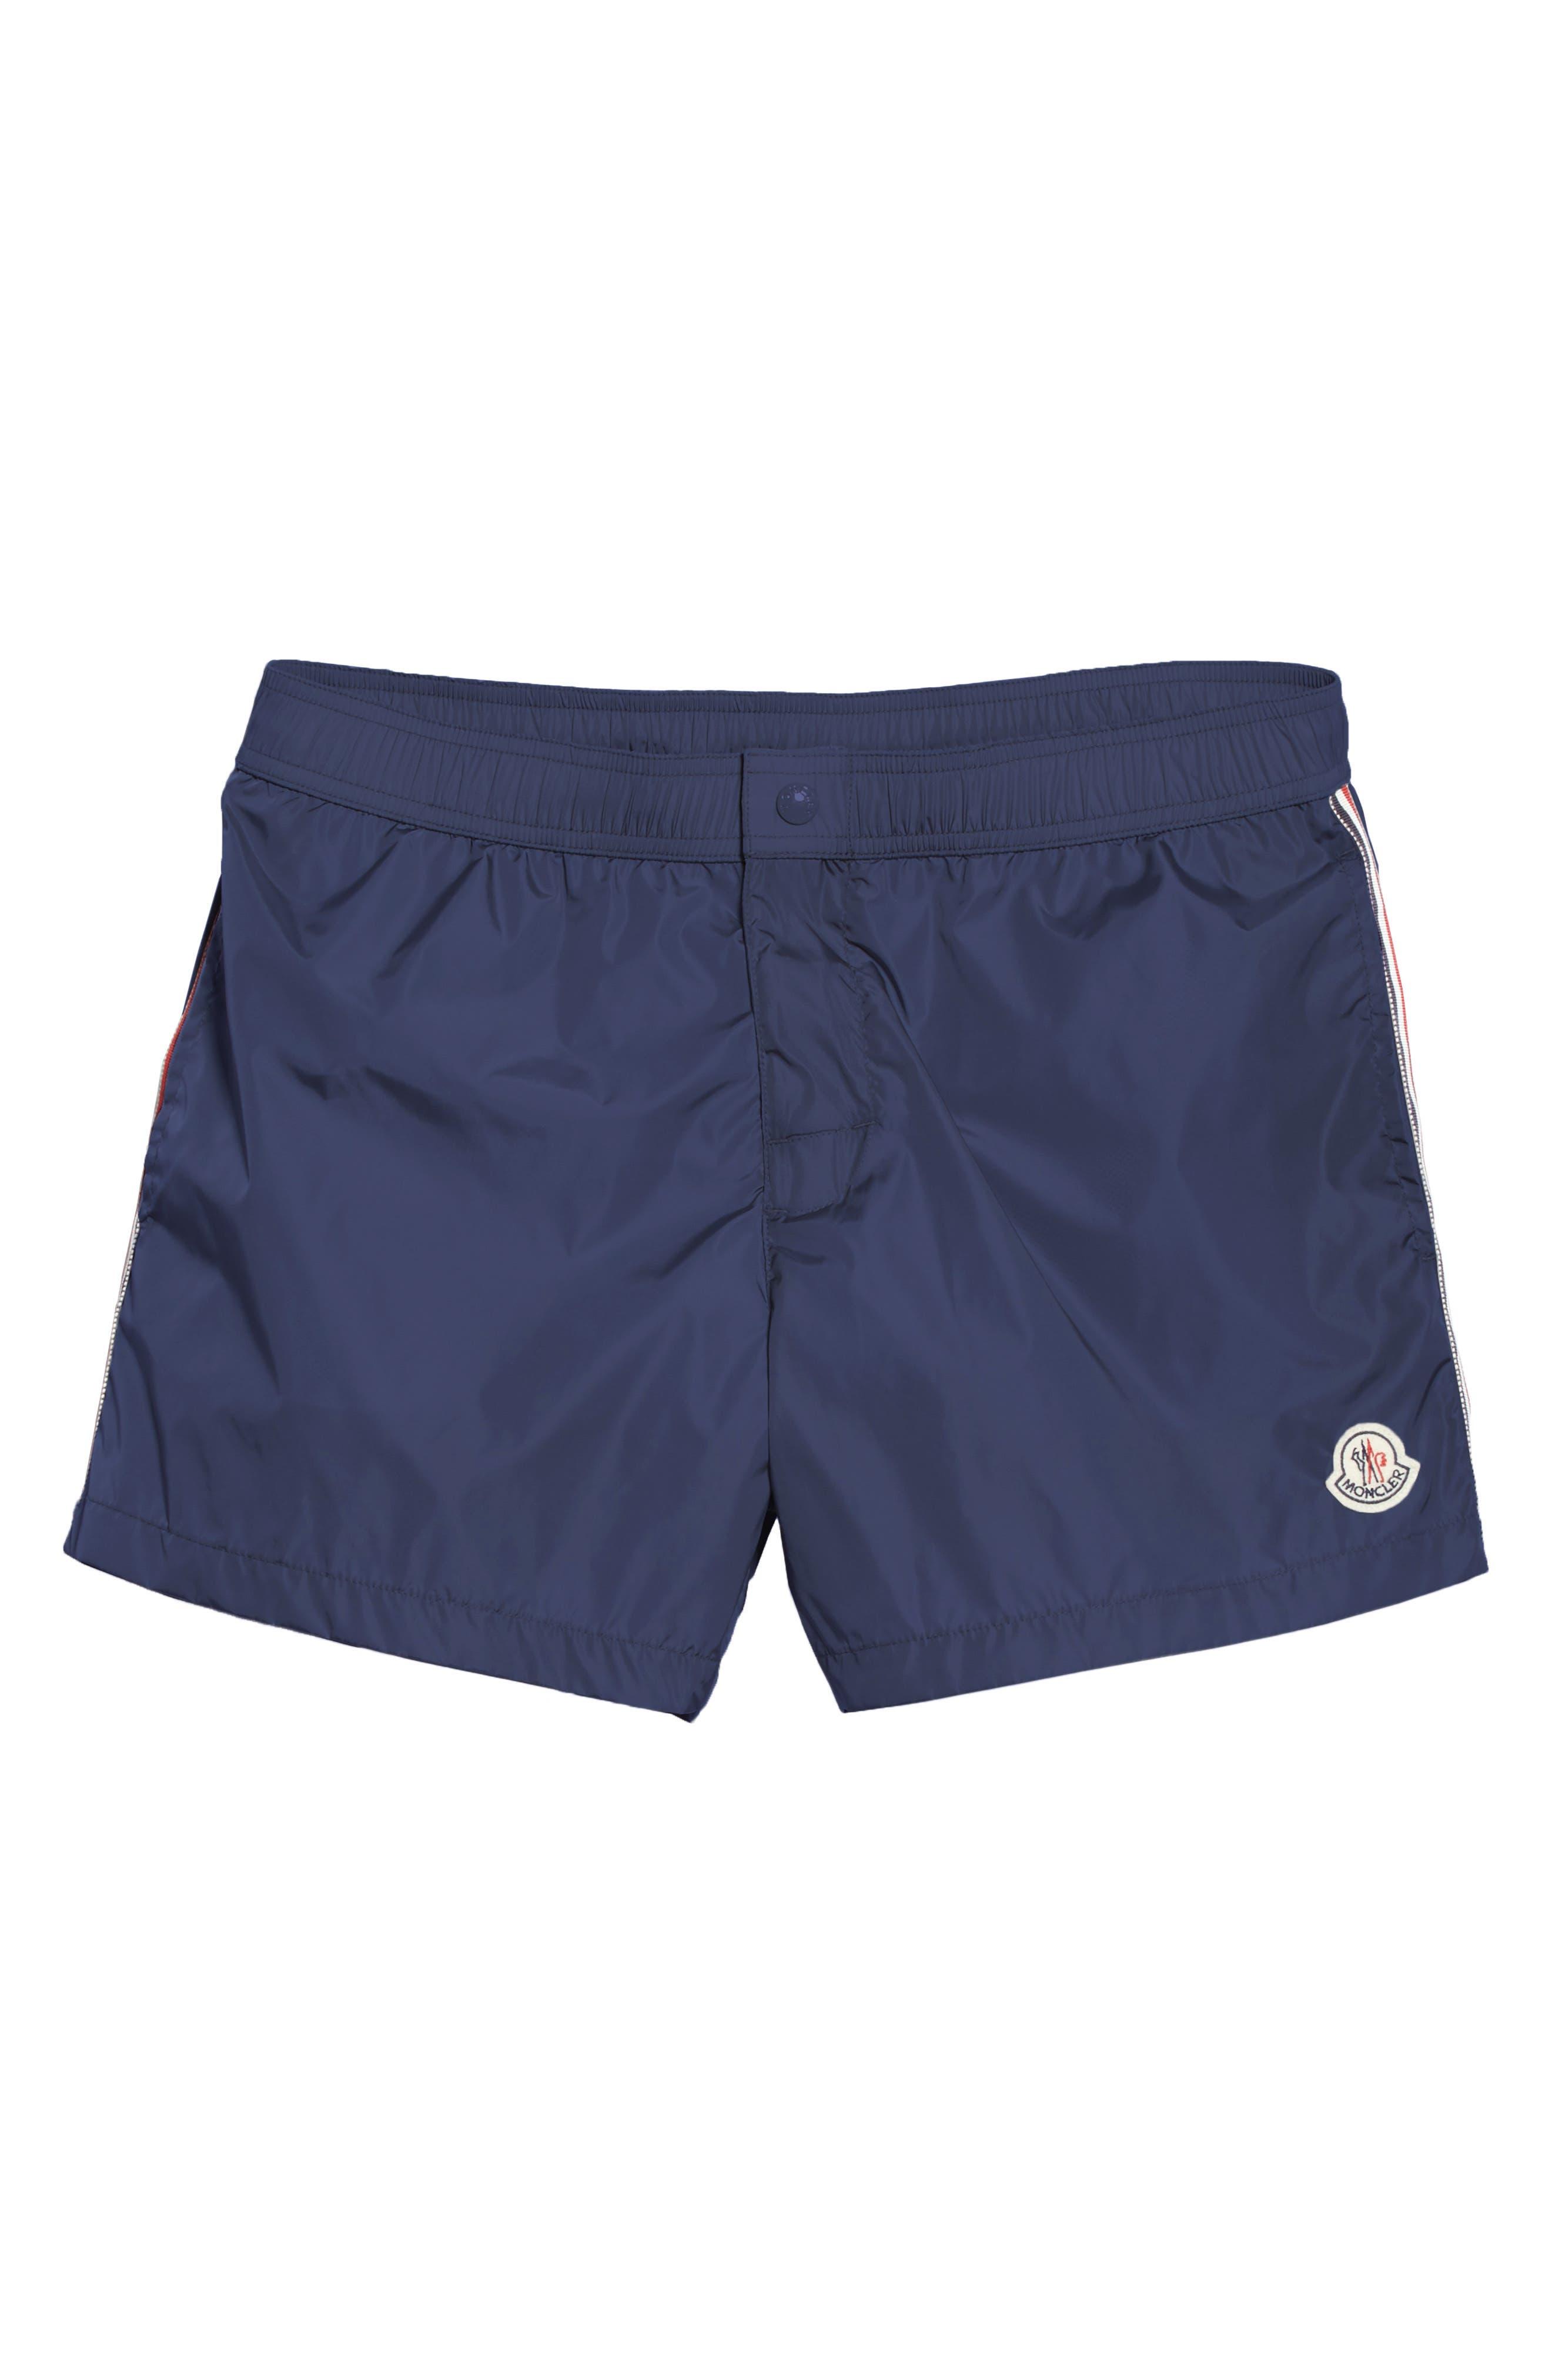 Boxer Mare Swim Shorts,                             Alternate thumbnail 6, color,                             BLUE